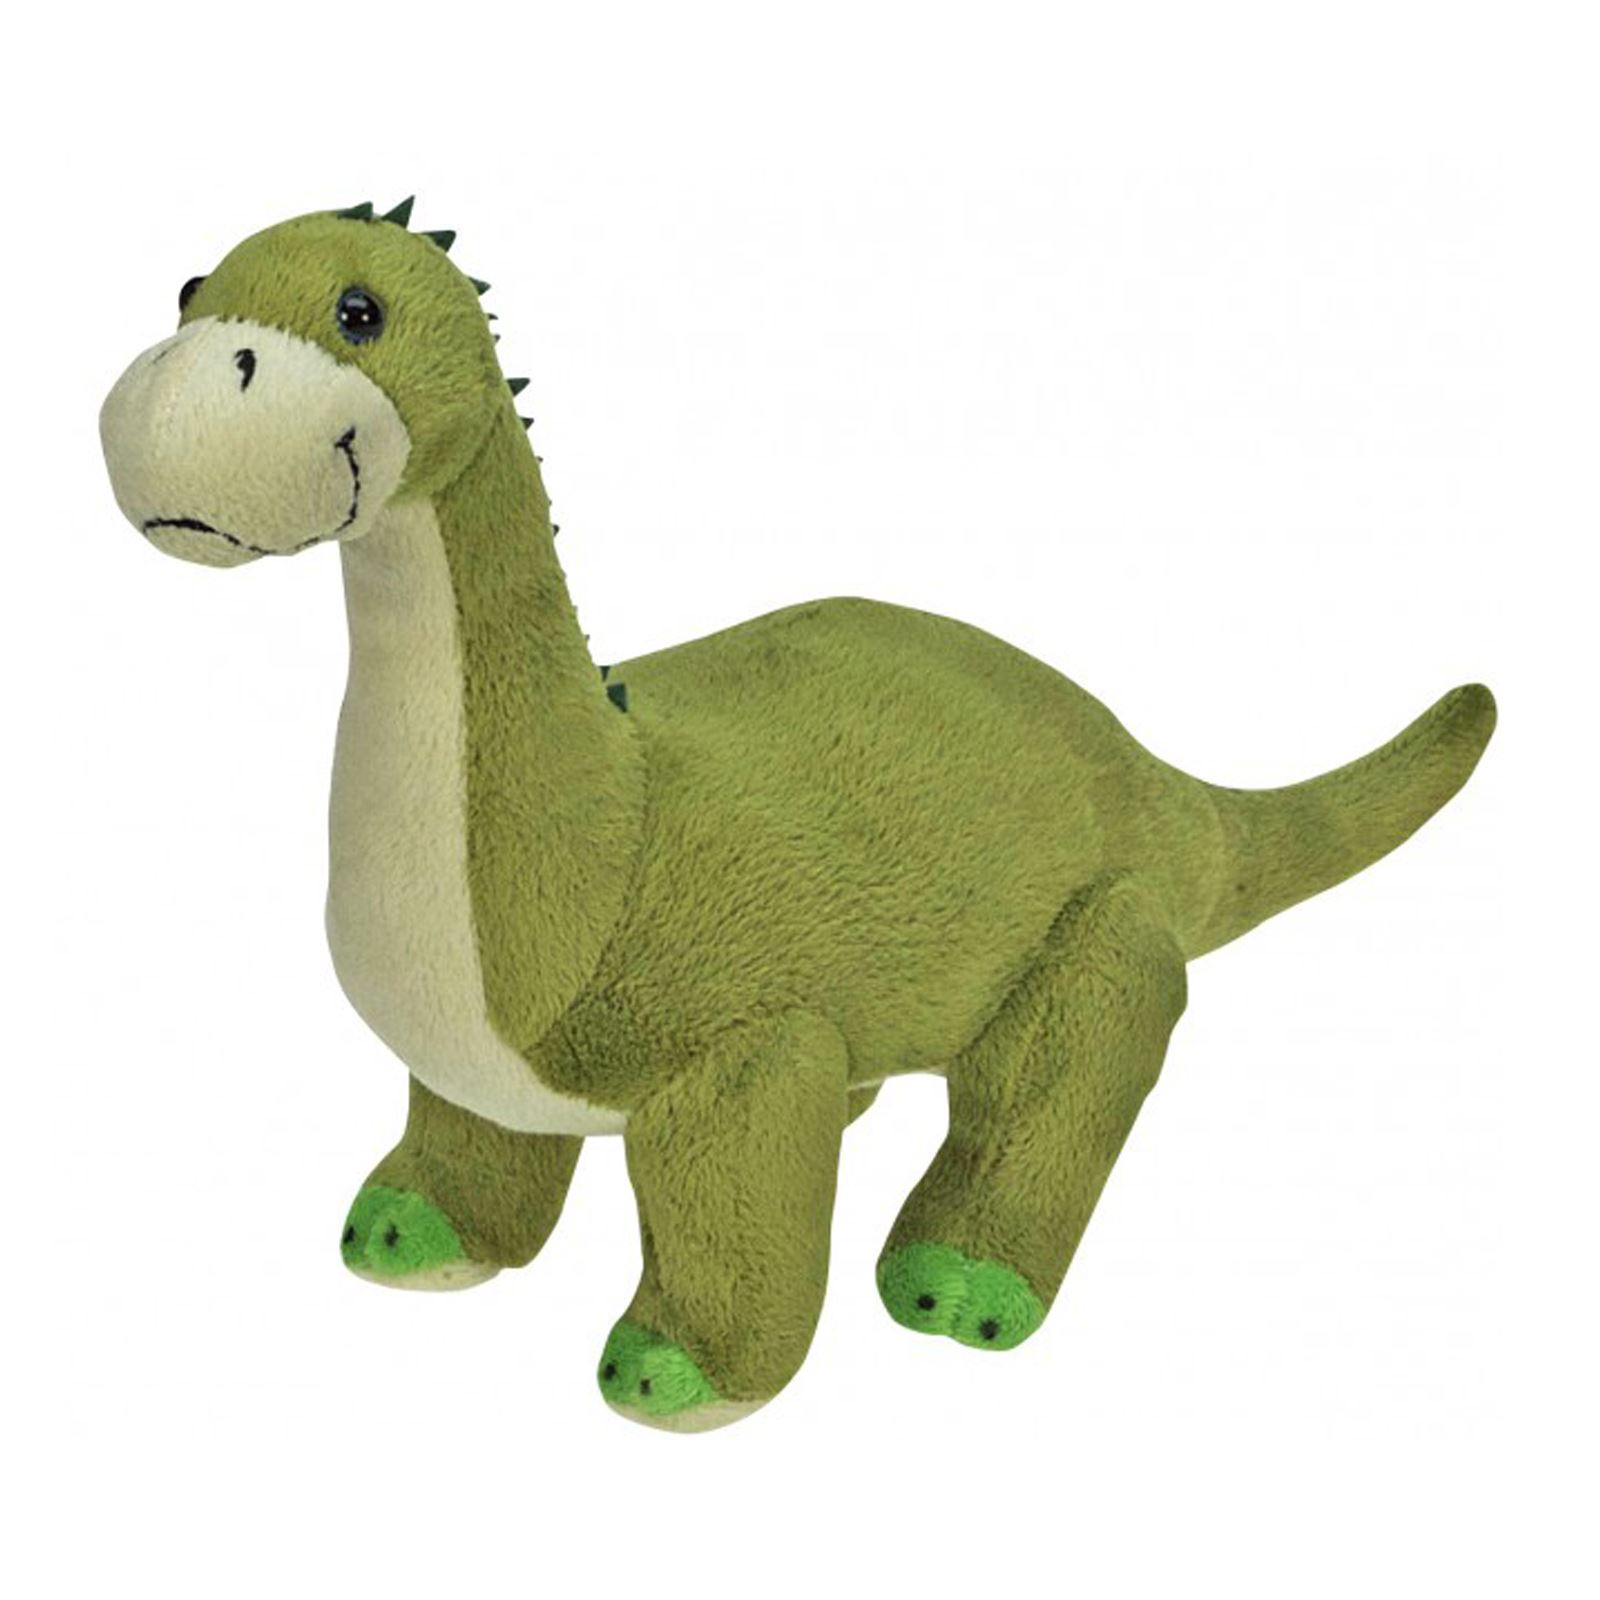 Plush Green Brontosaurus Good Cuddly Soft Toy Dinosaur Stuffed Animal Kids Gift  Ebay